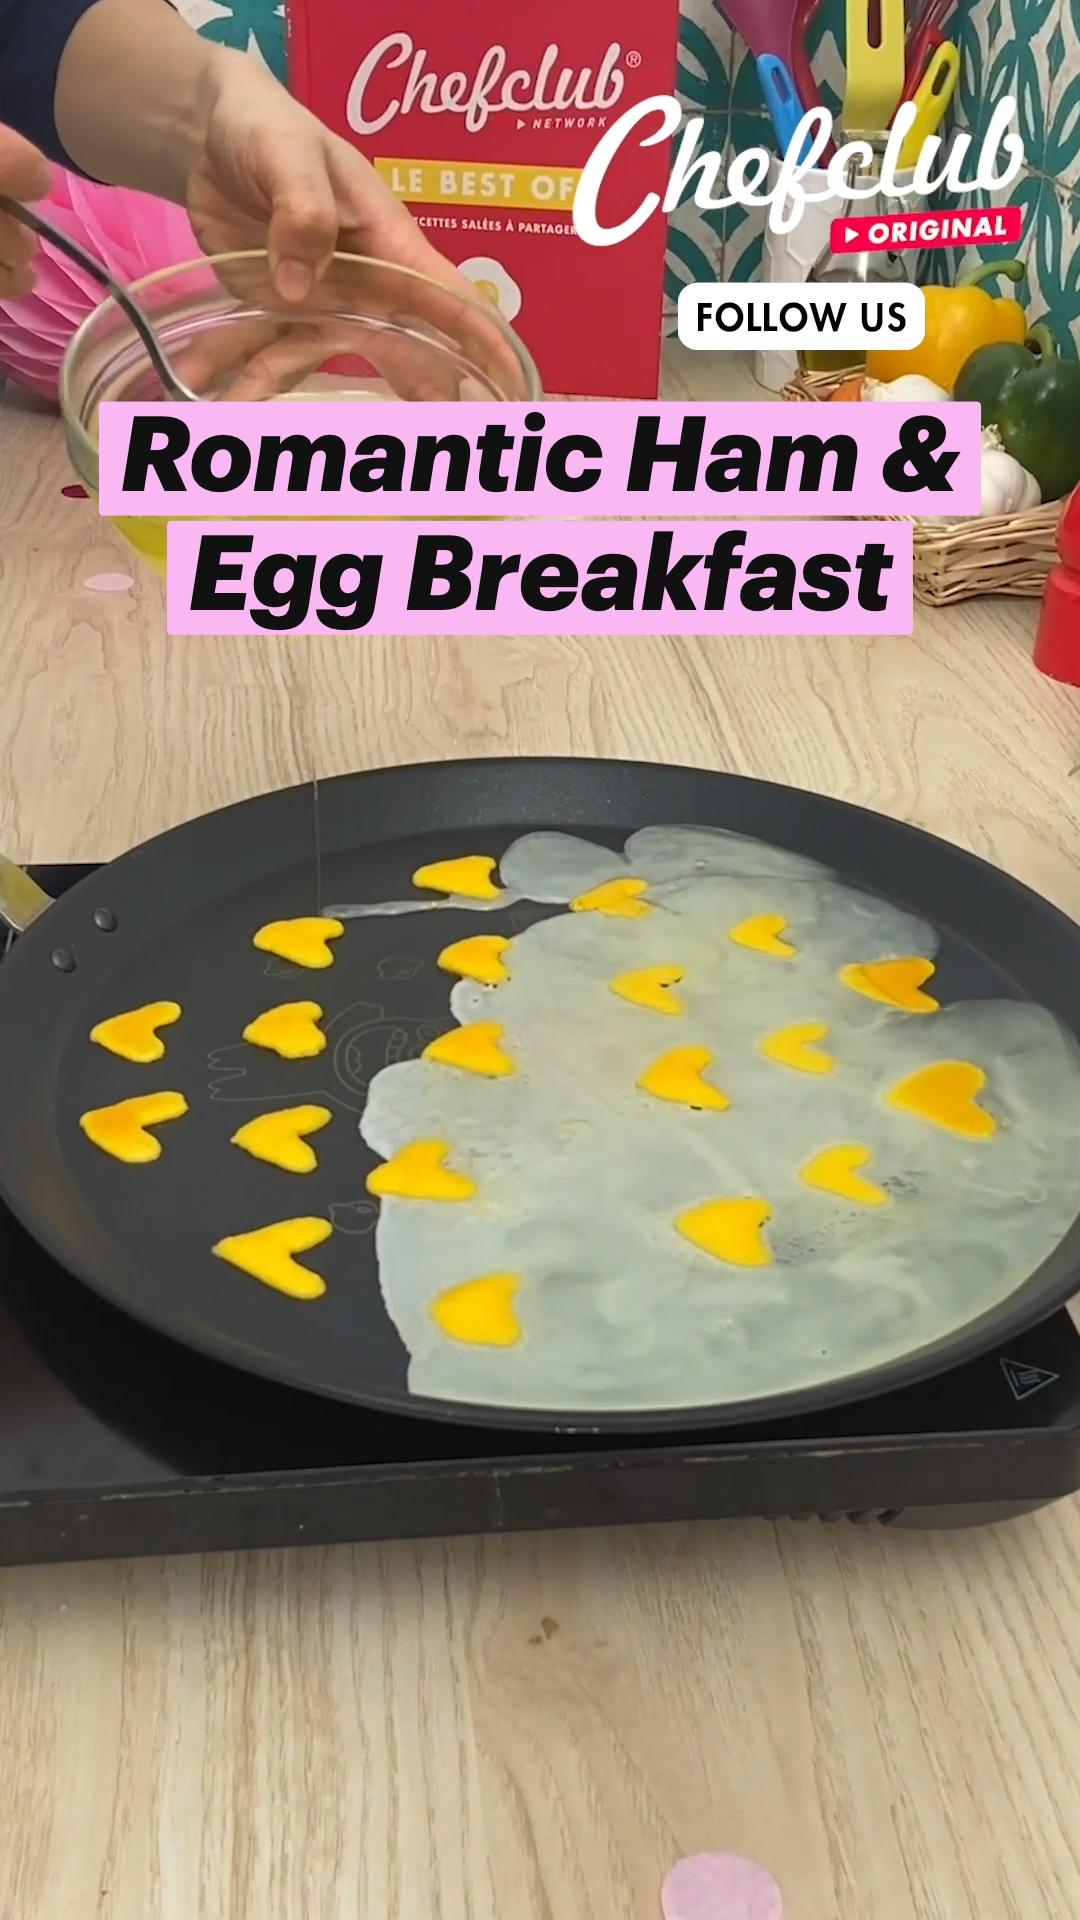 Romantic Ham & Egg Breakfast